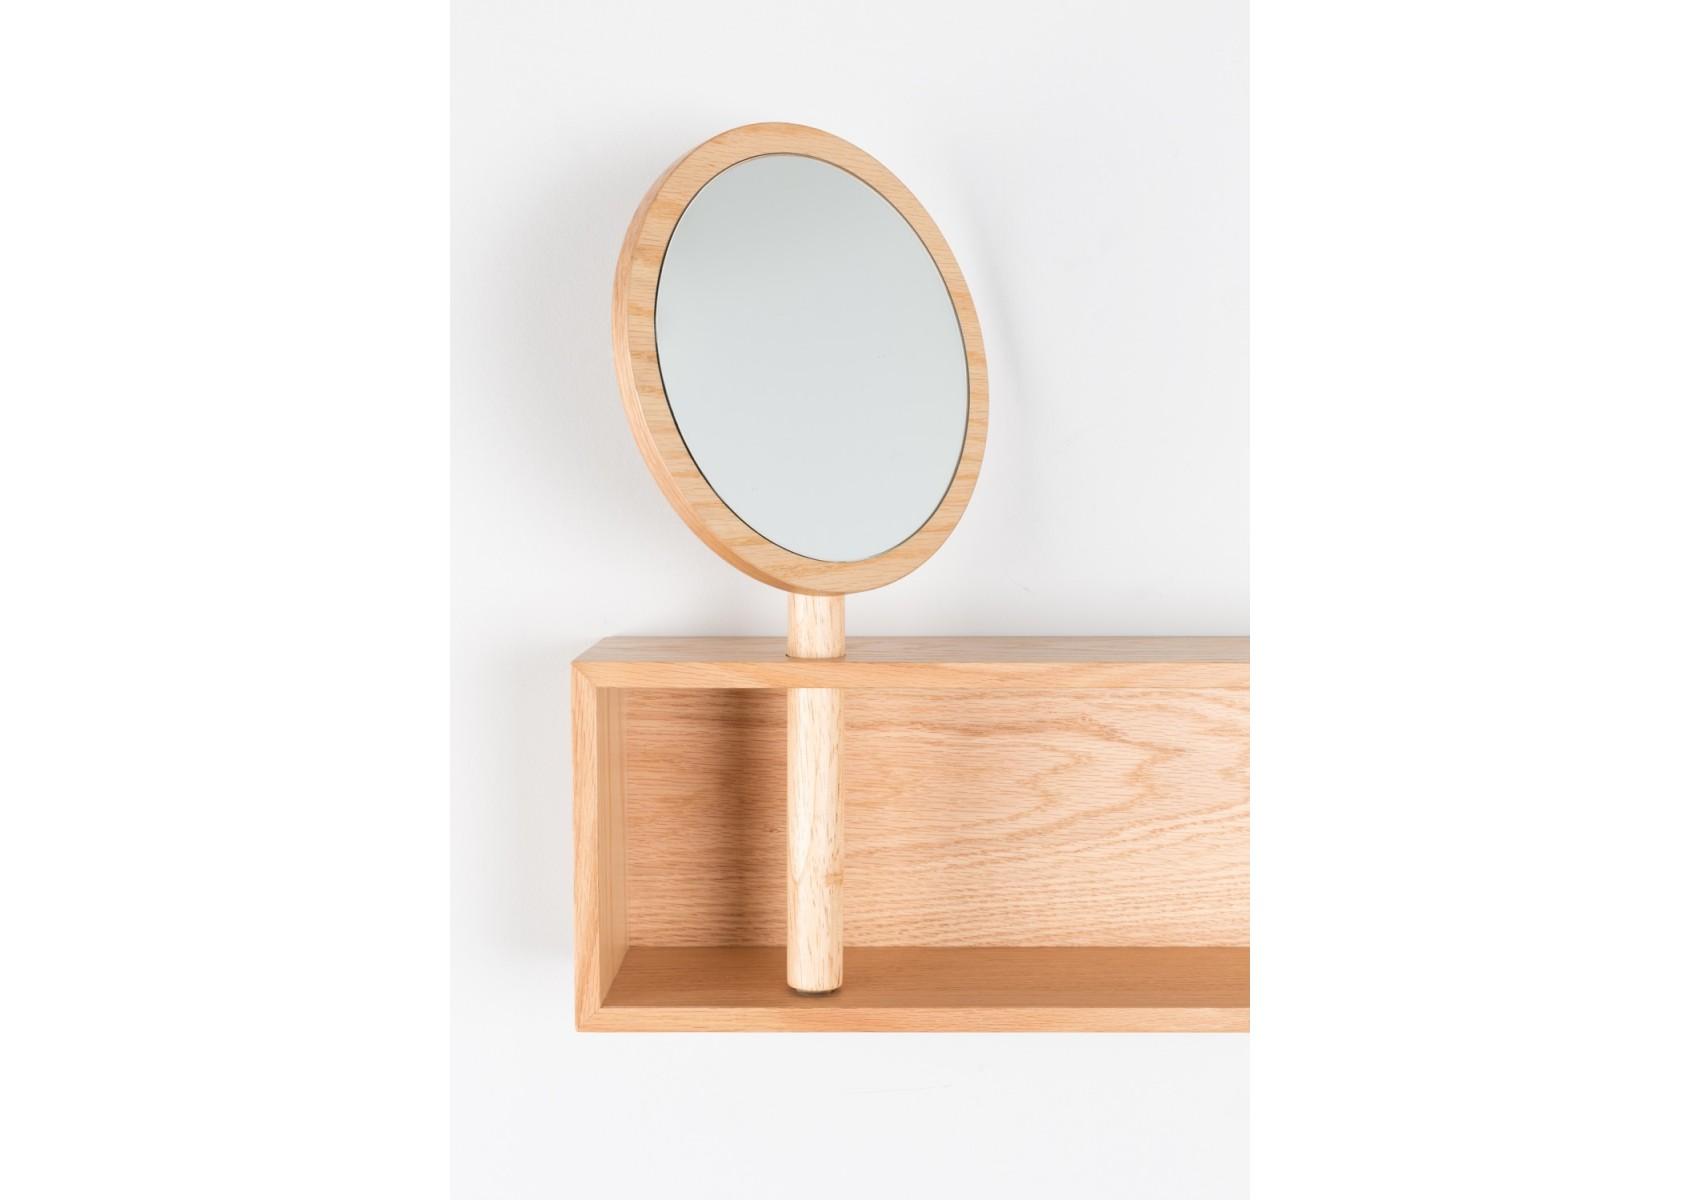 Etag re murale design avec miroir pivotant kandy zuiver for Miroir zuiver